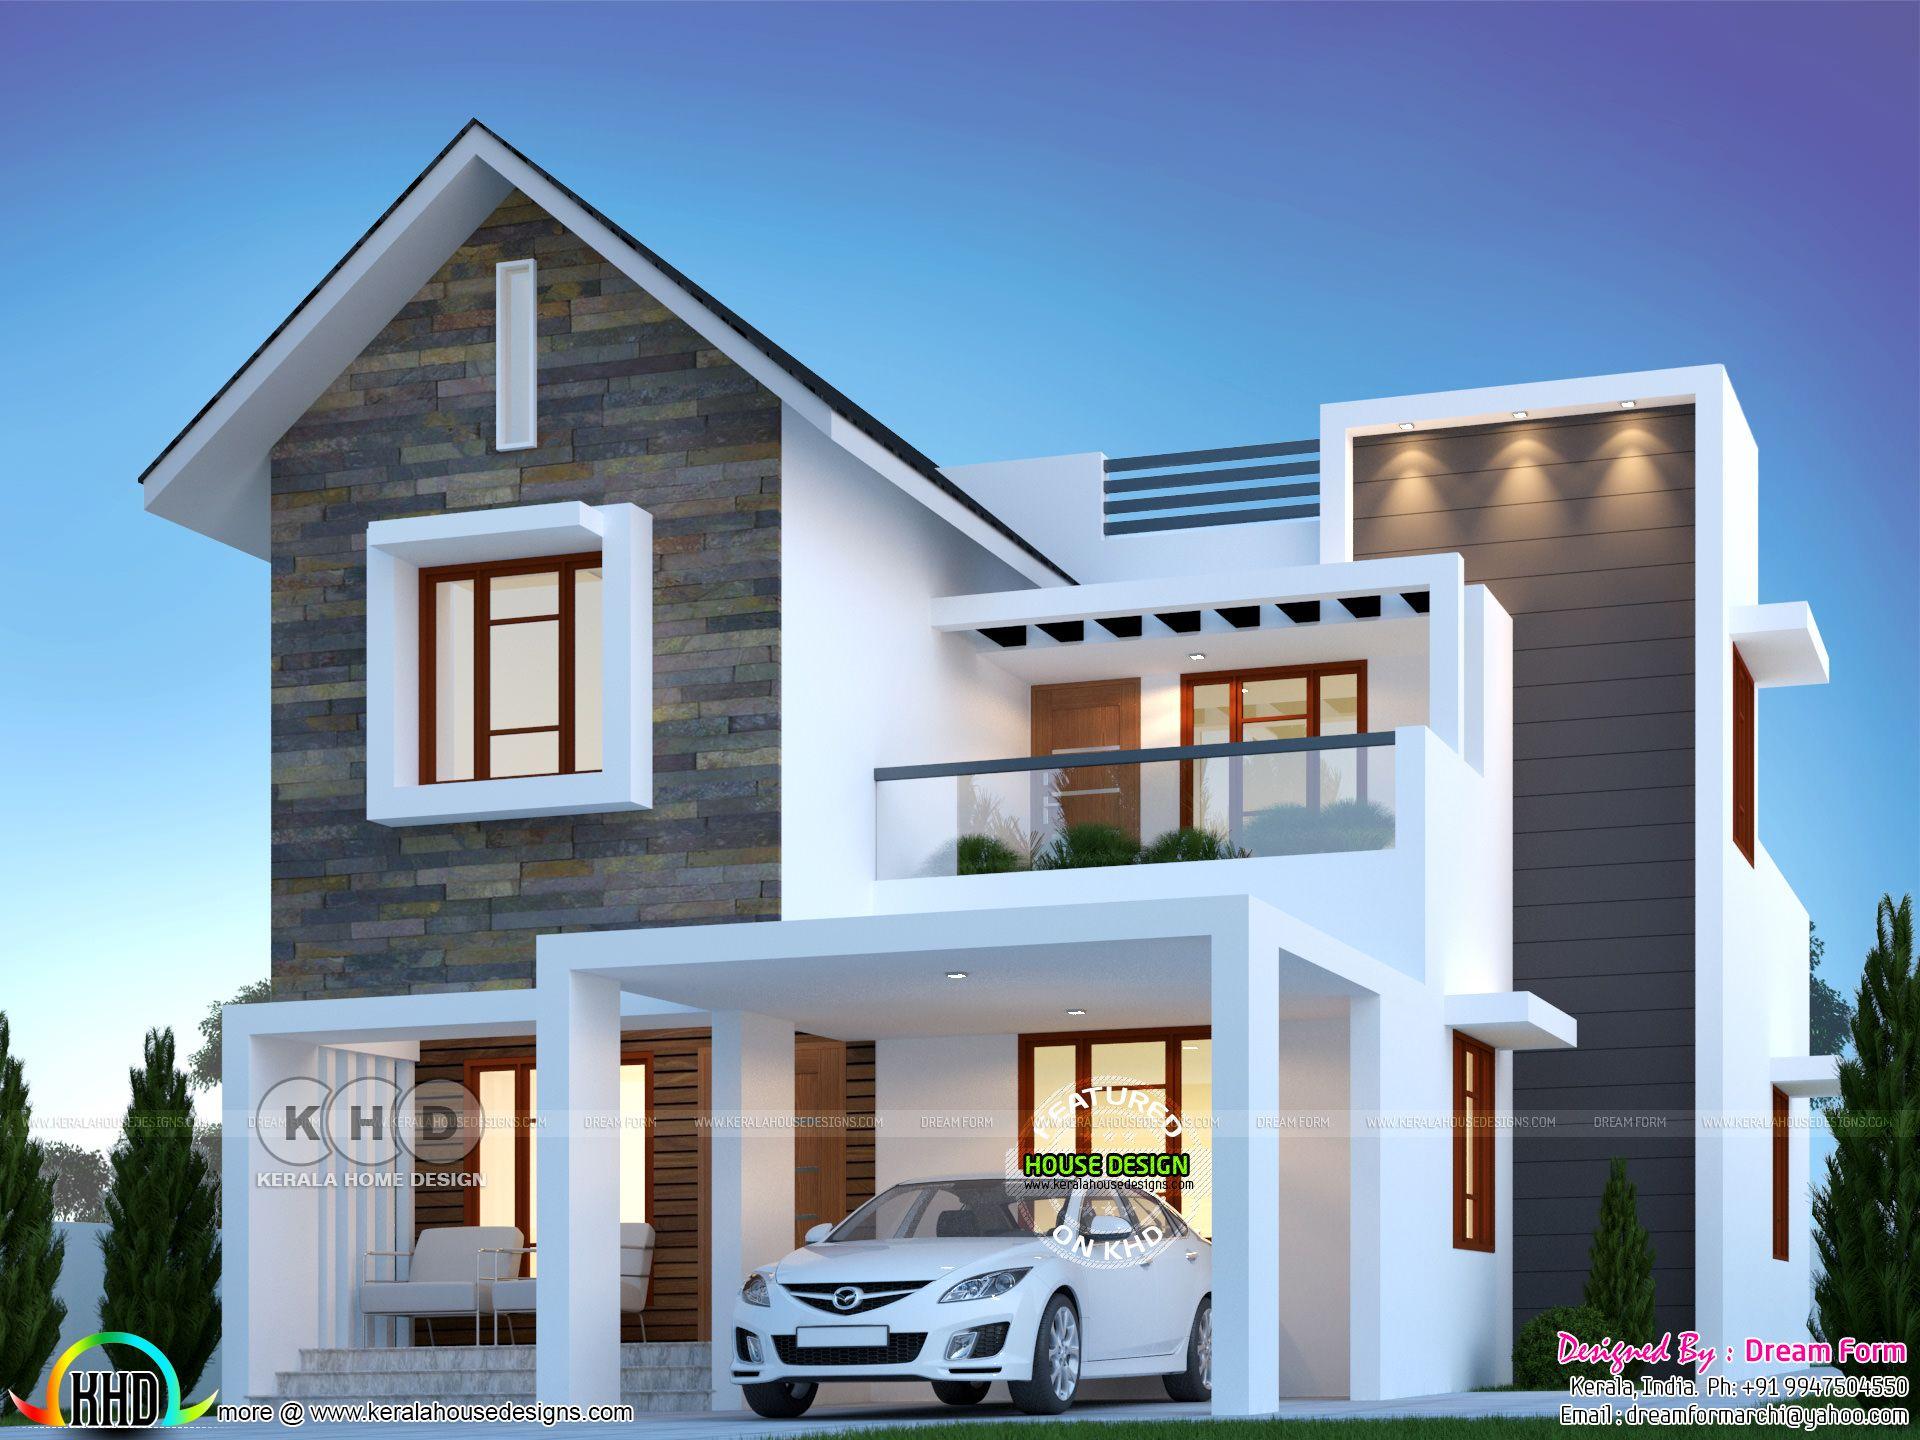 4 Bedroom 1900 Sq Ft Modern Home Design In 2020 House Outside Design Kerala House Design House Front Design